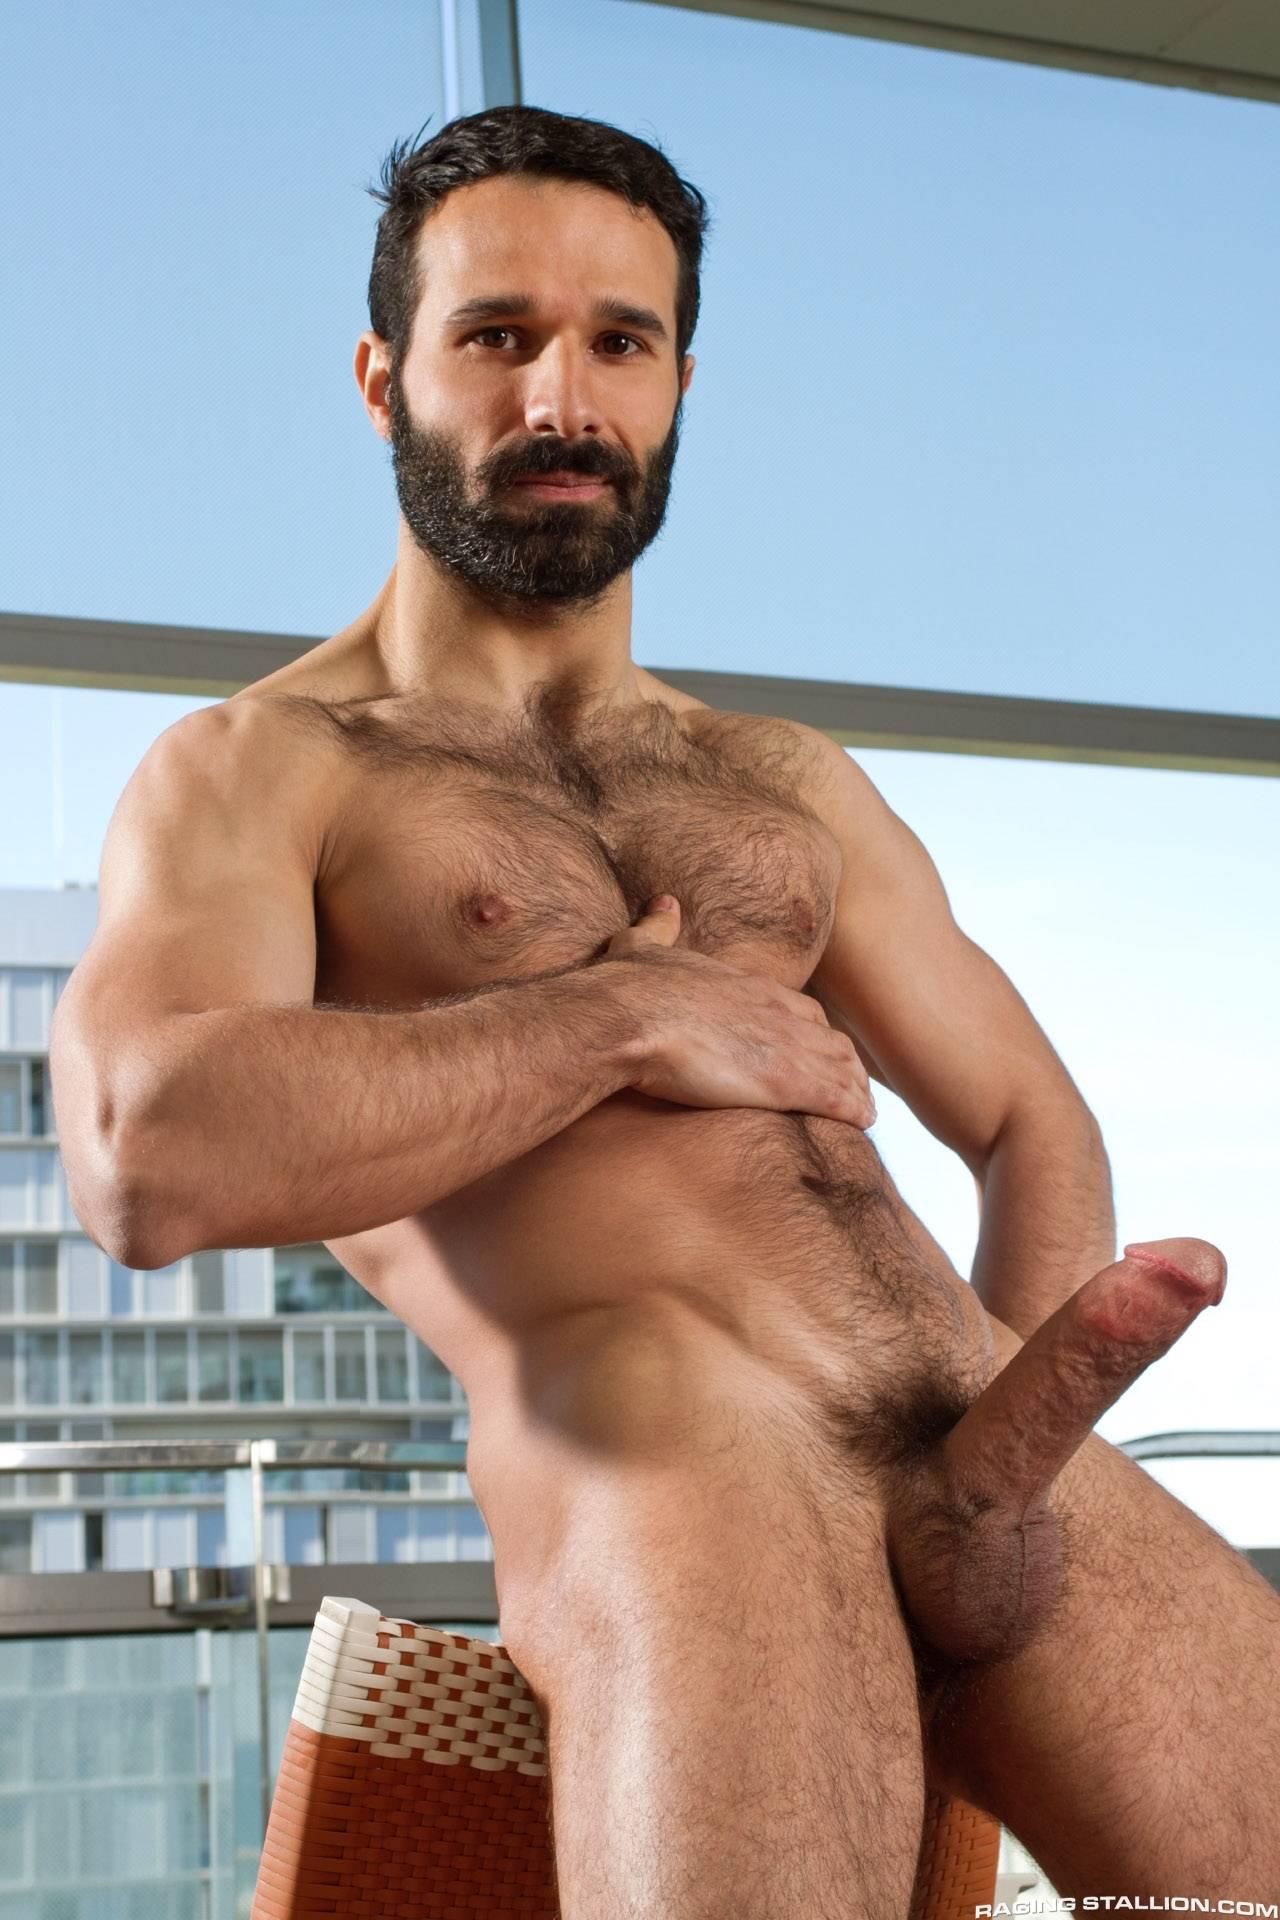 Hairy legs turkish gay officer christian 9